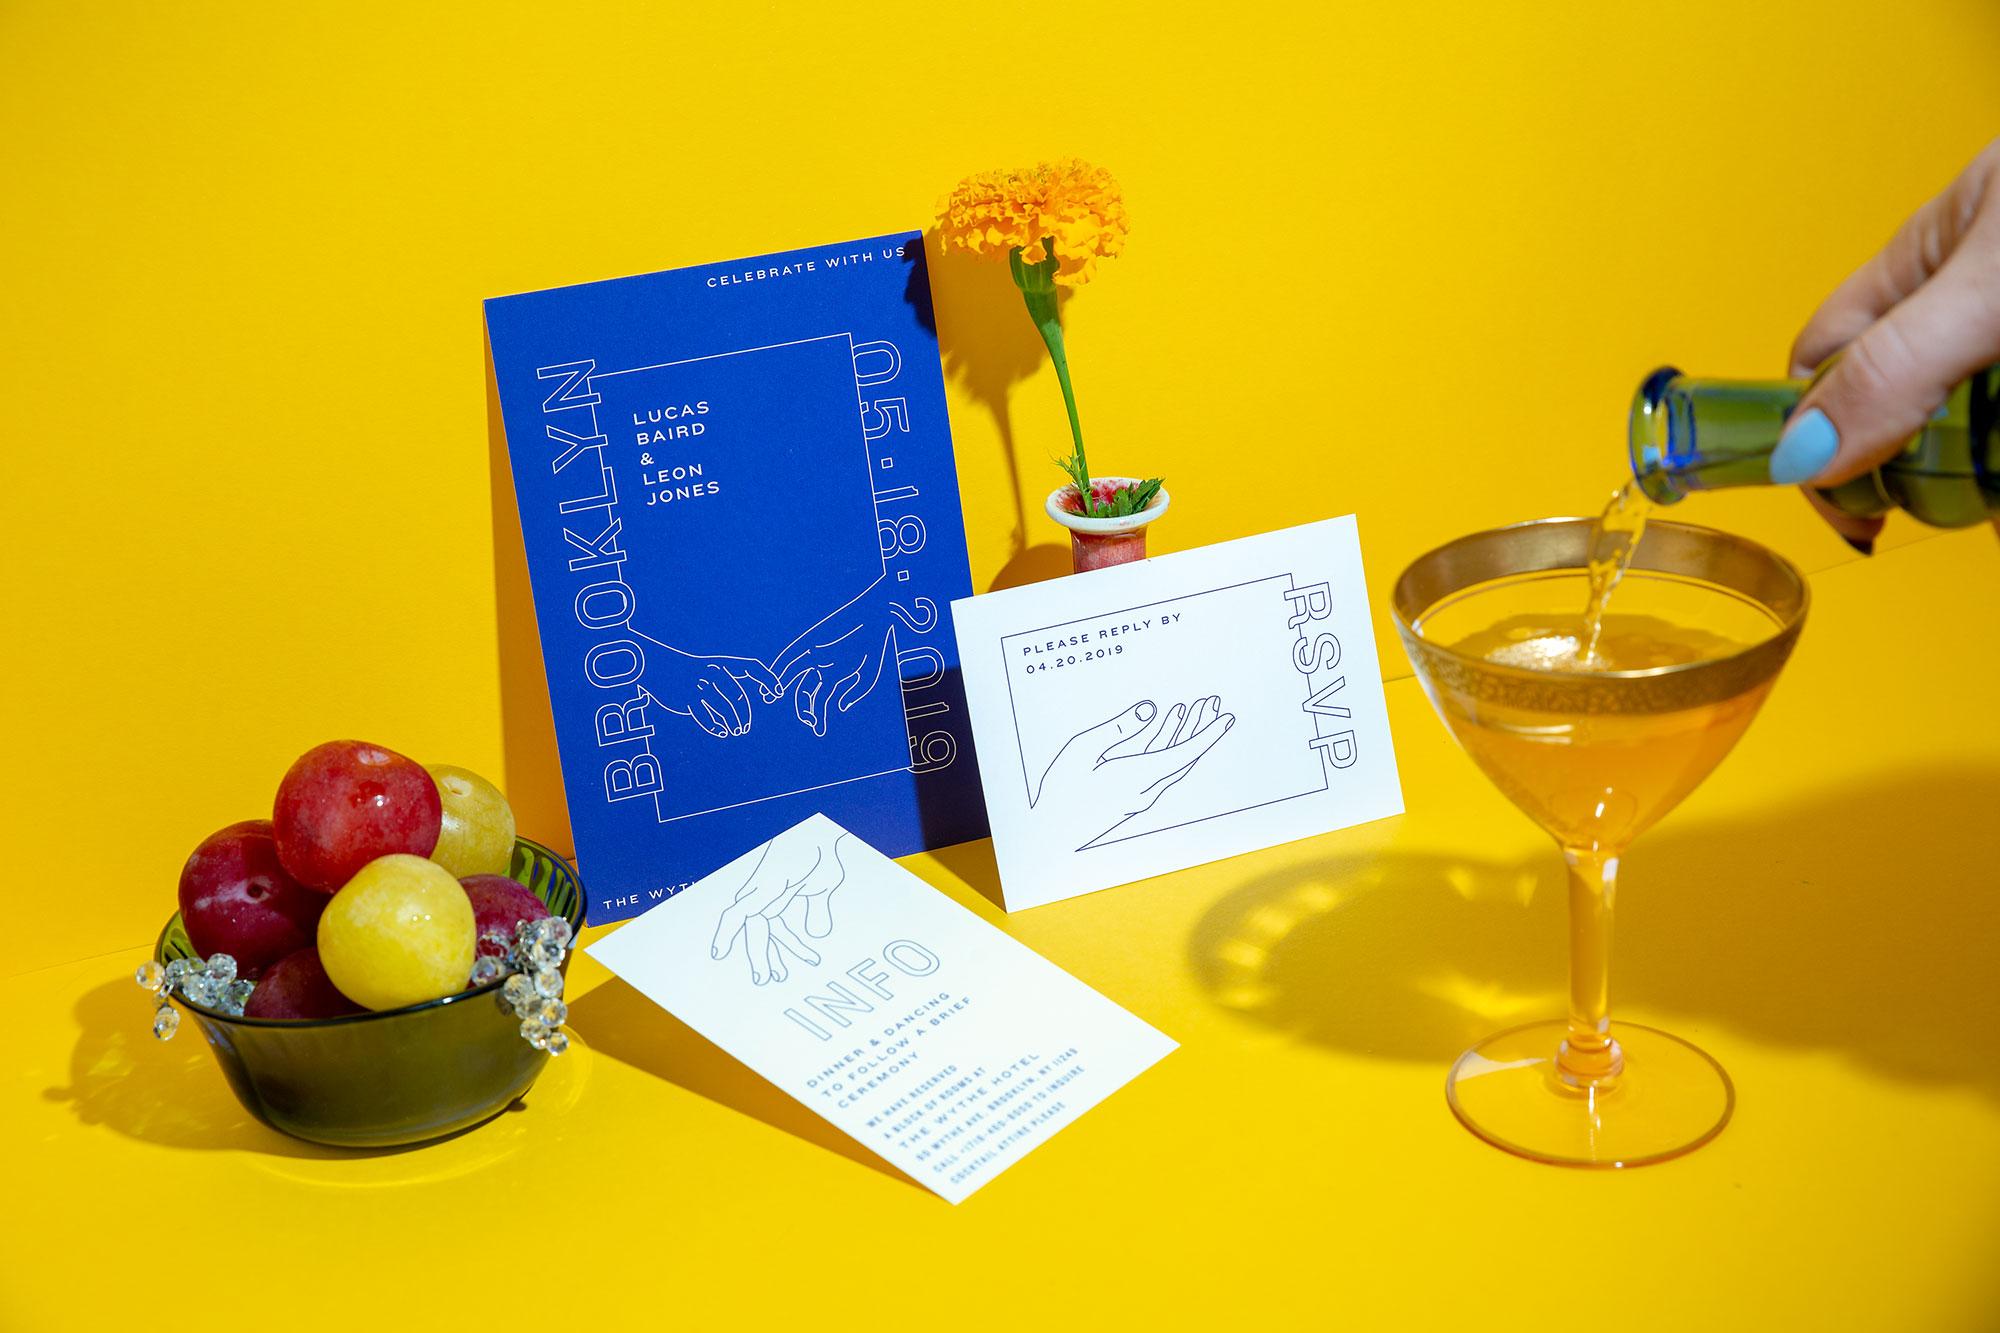 hands wedding invitation suite by eco-friendly paper goods design studio ephemora